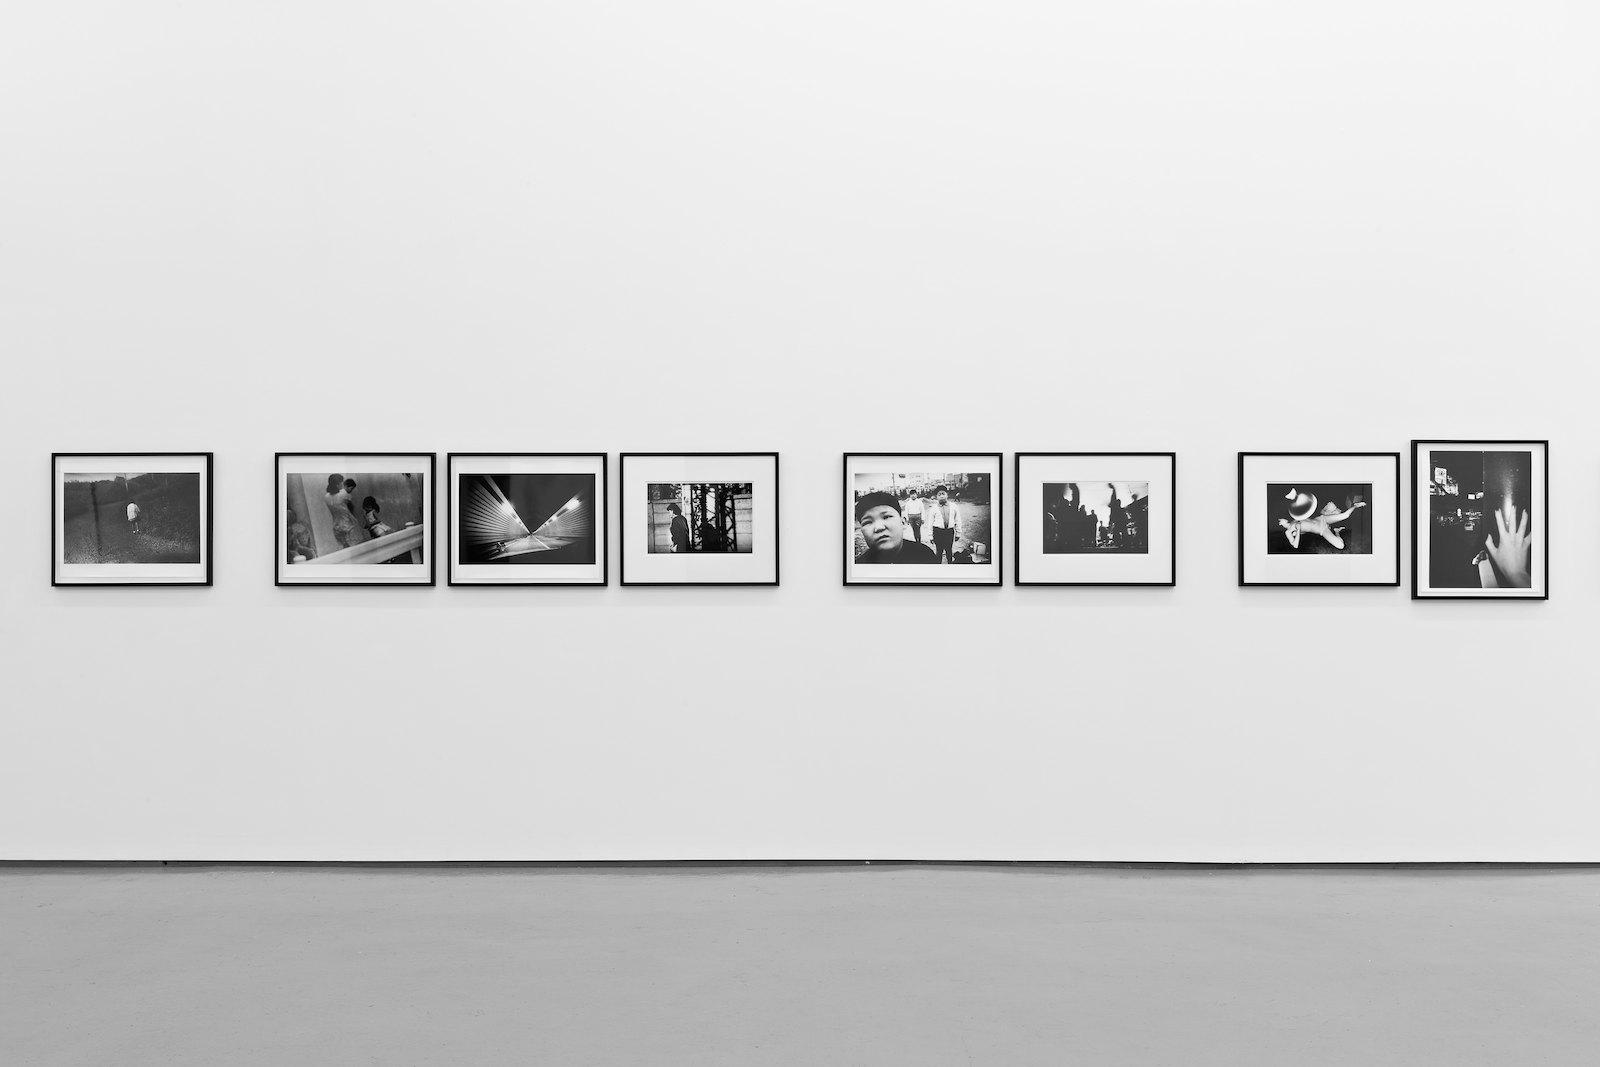 Installation view, Galleri Riis, Oslo, 2014